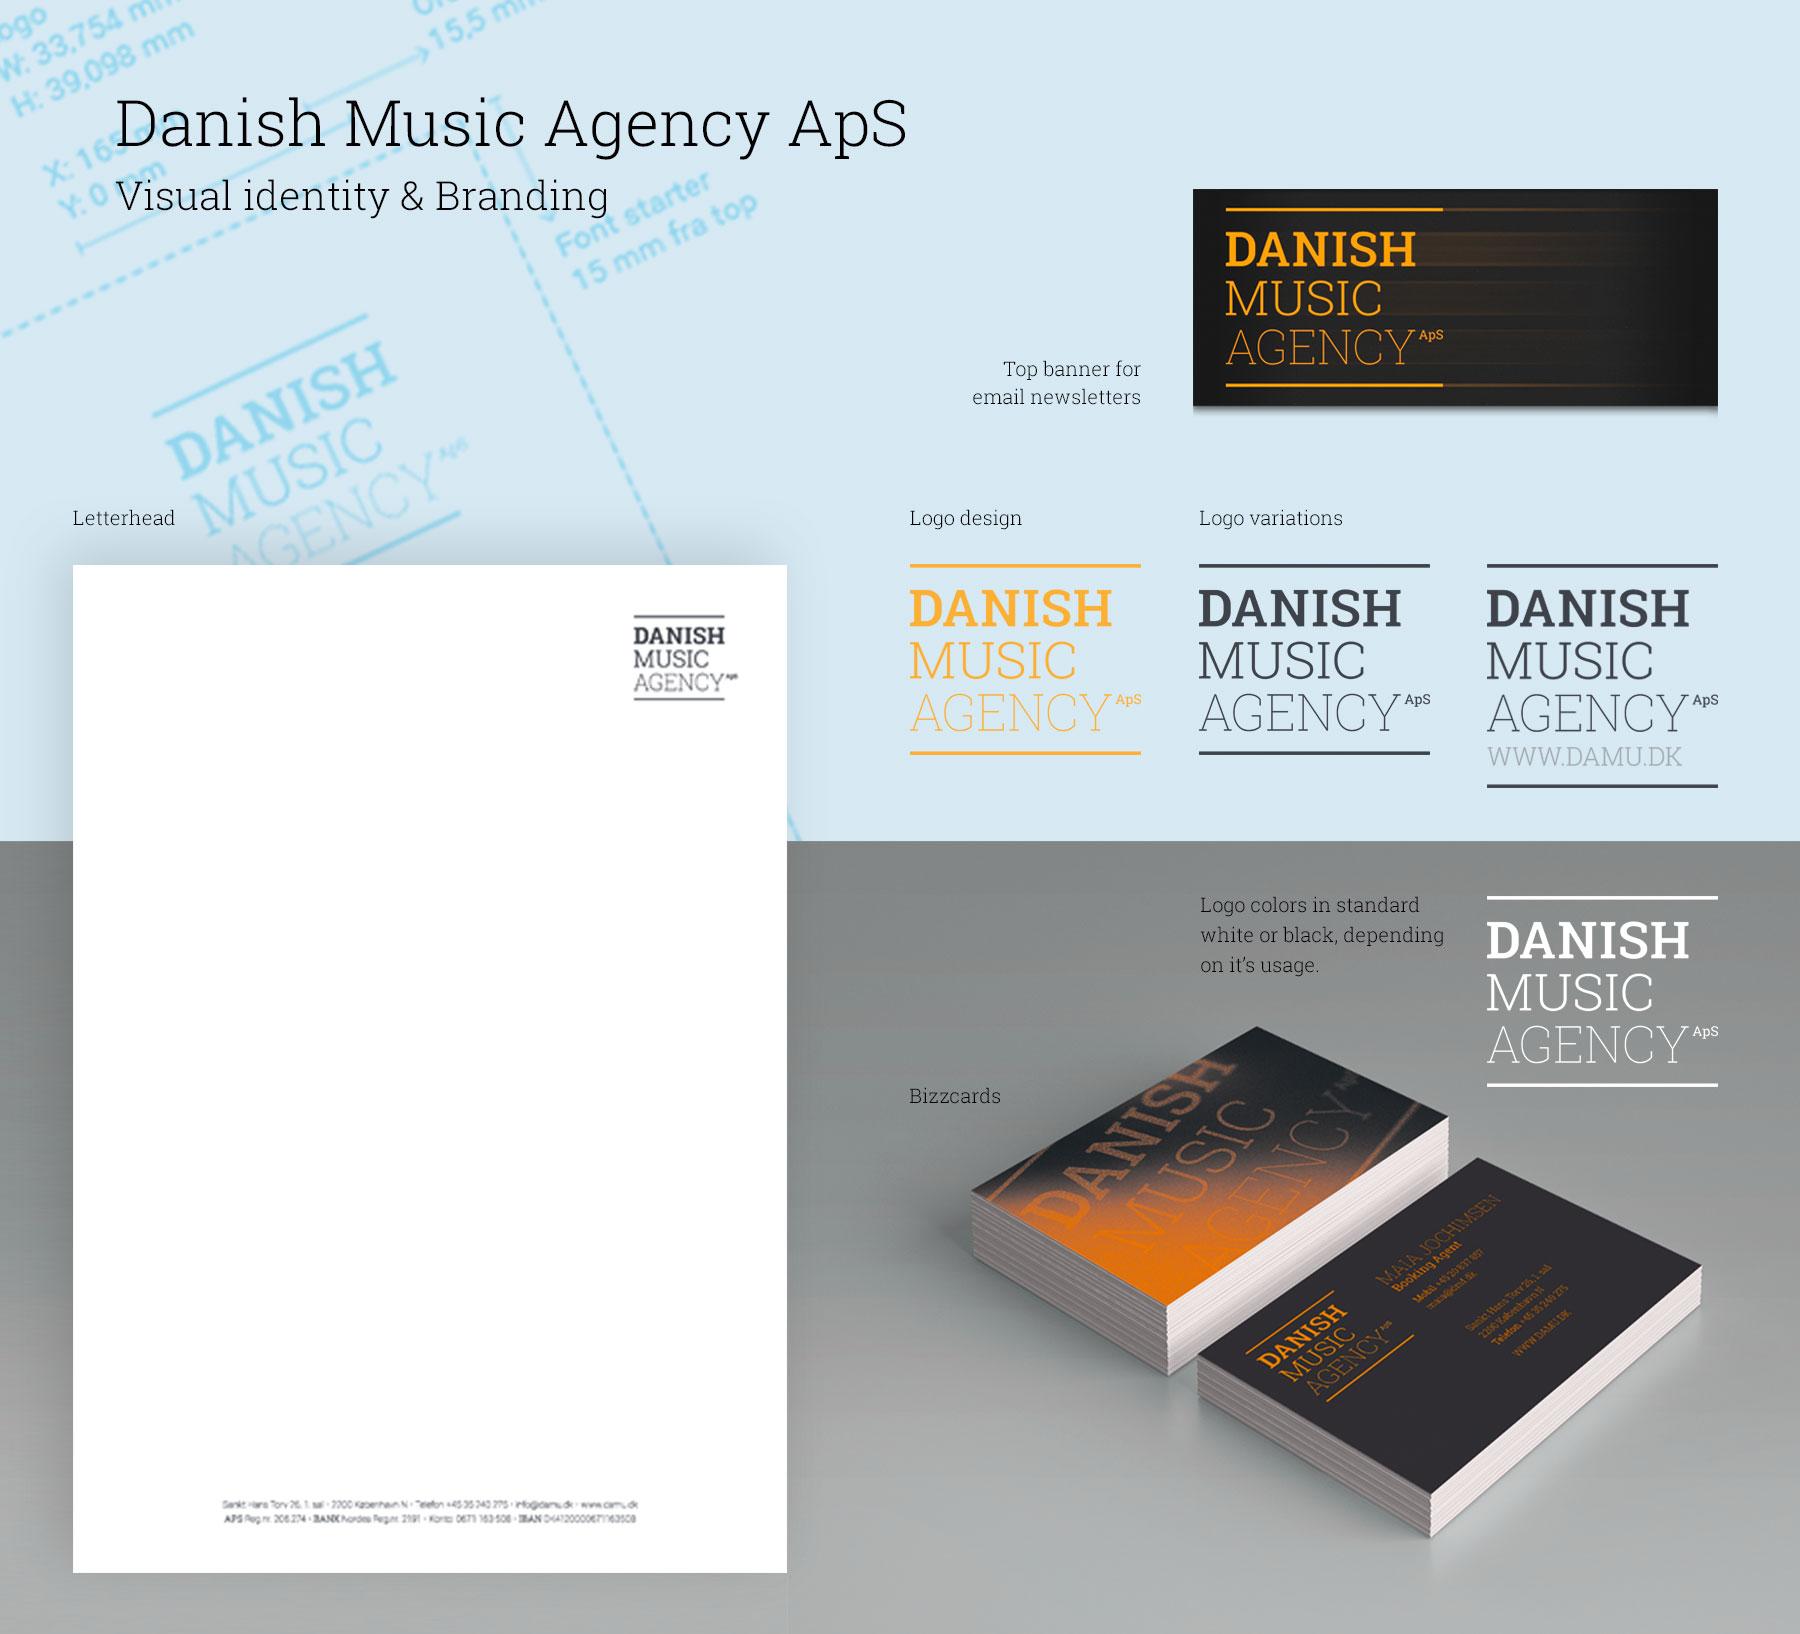 Danish Music Agency's new identity